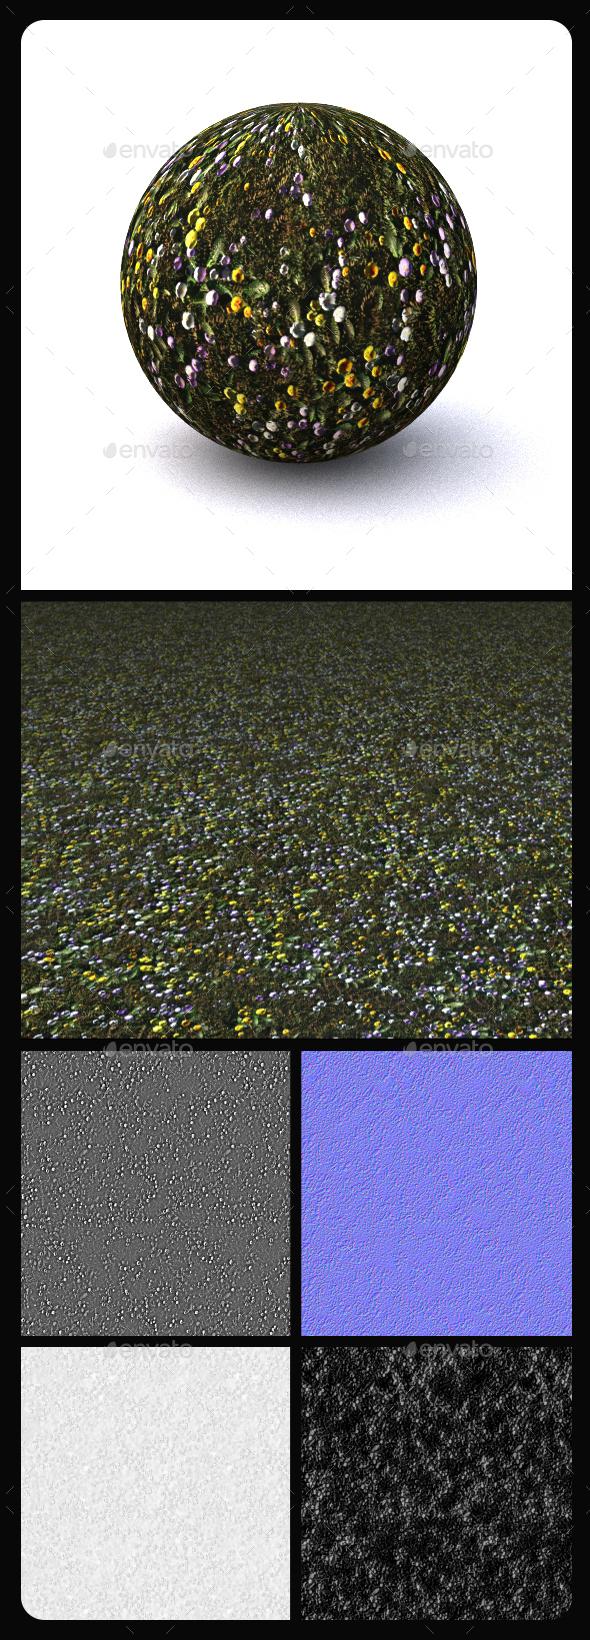 Grass Tile Texture 13 - 3DOcean Item for Sale